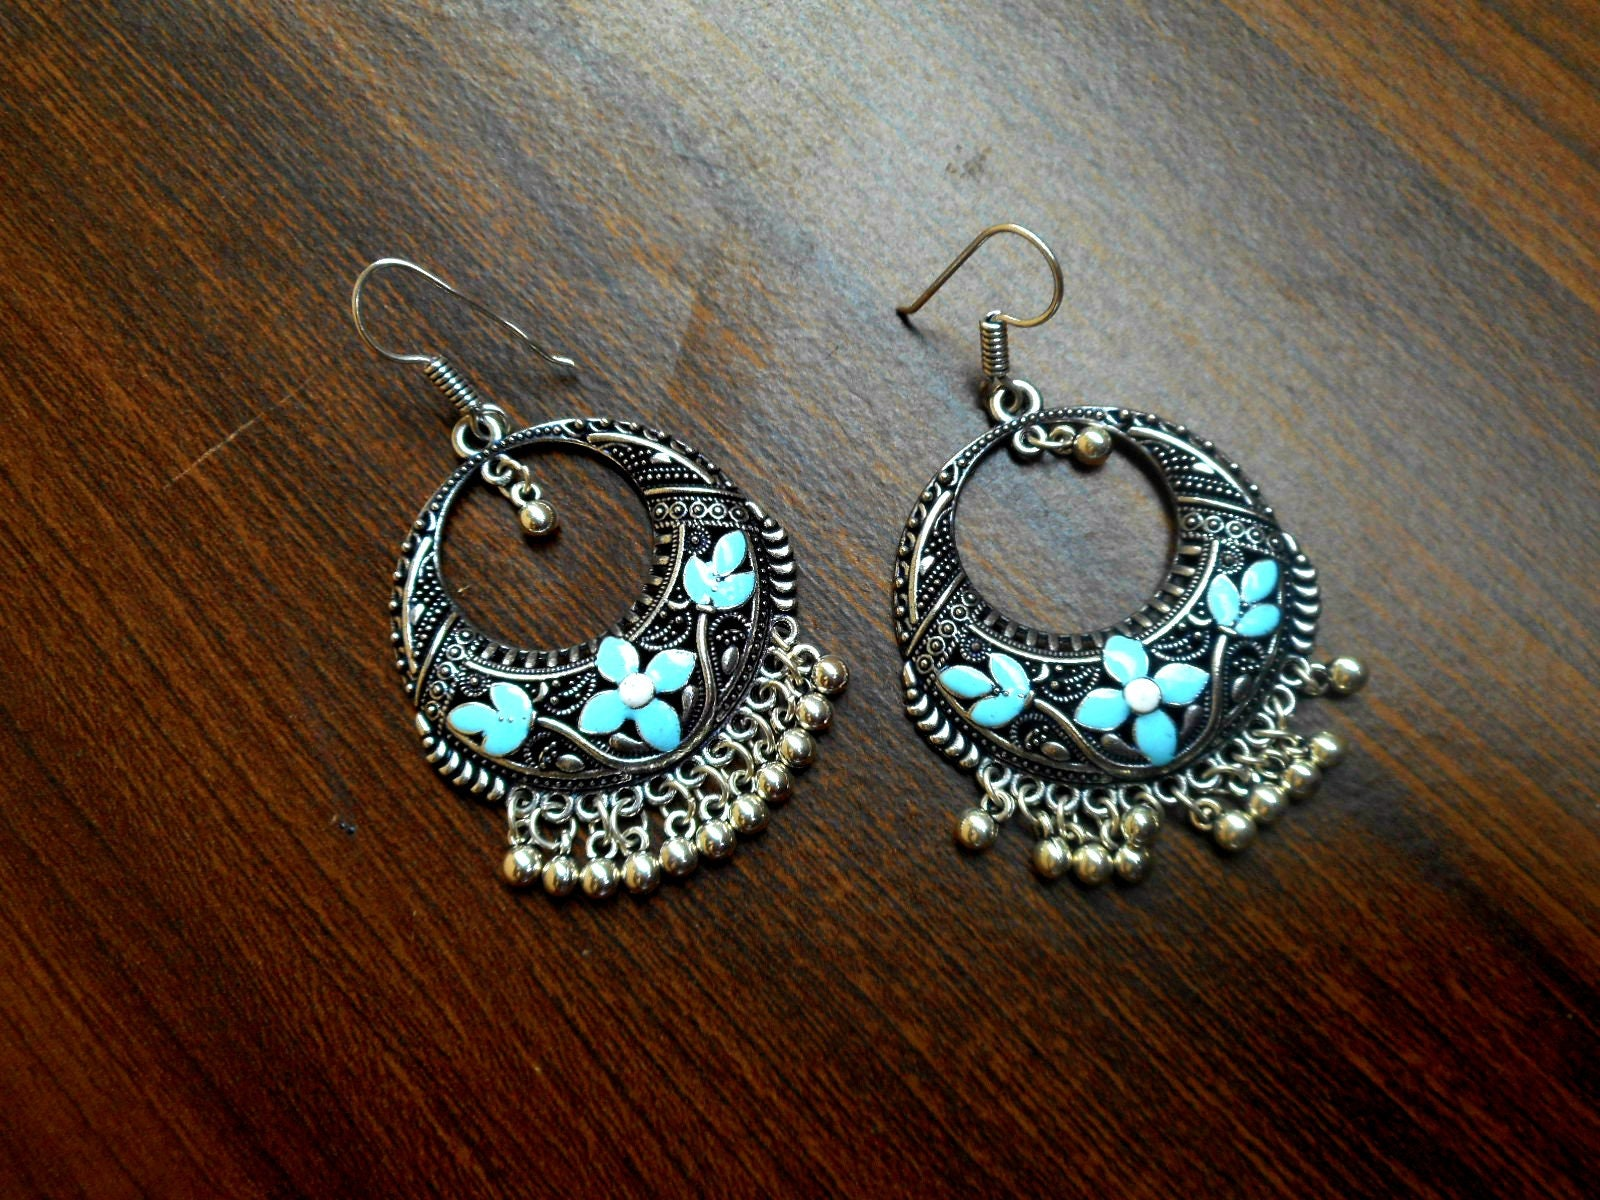 2082748be Chandbali earrings // Oxidized jewellery from India // Dangle | Etsy